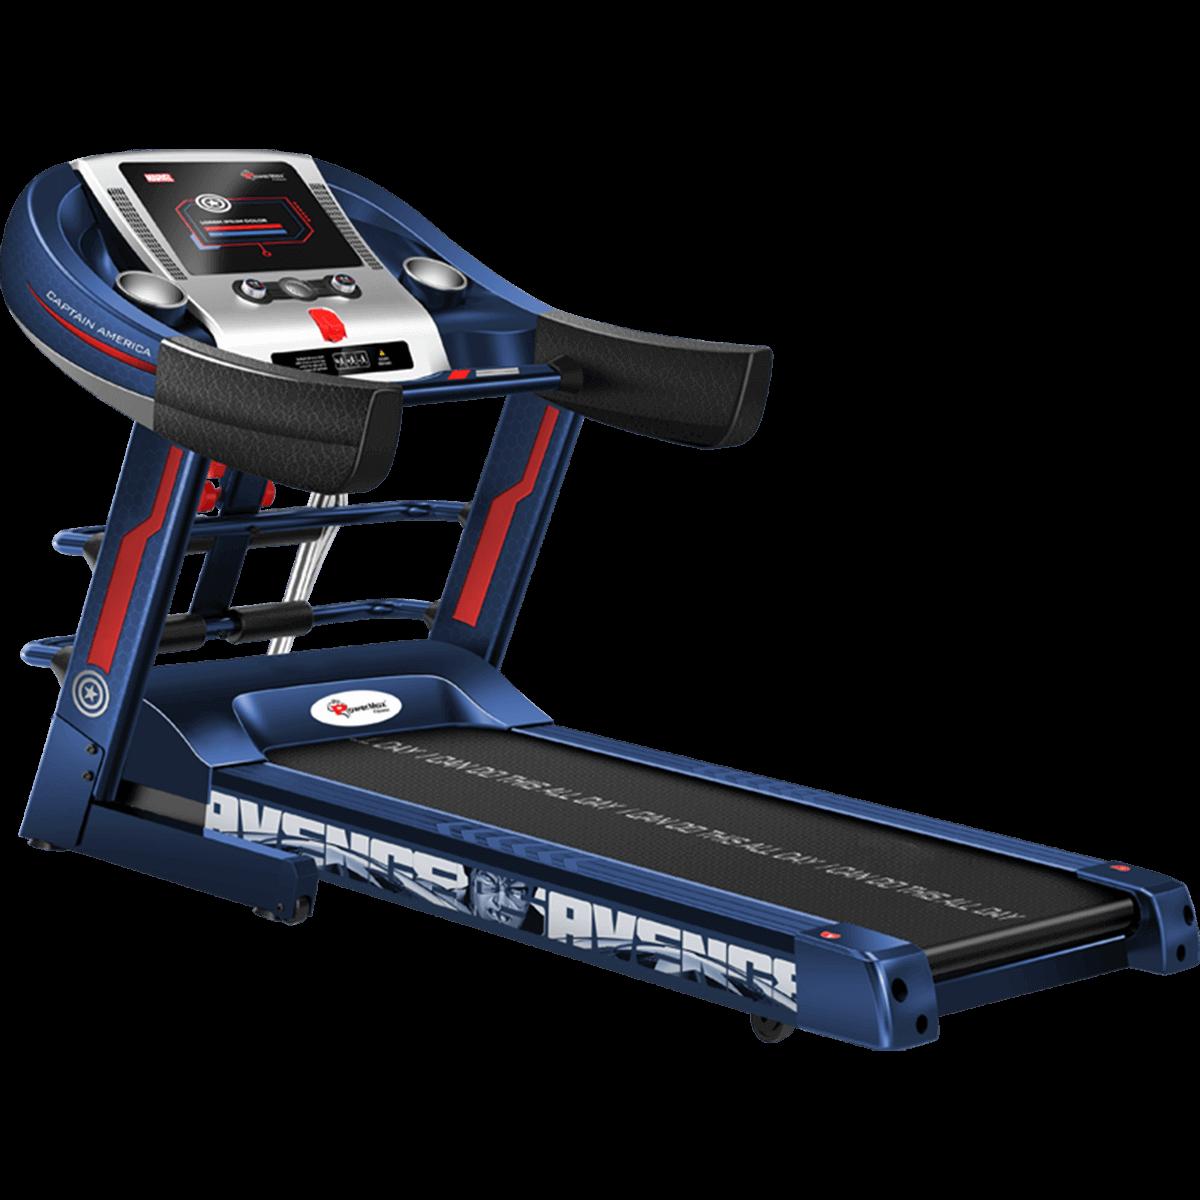 MTM-1000M Semi-Auto Lubrication Multifunction Treadmill